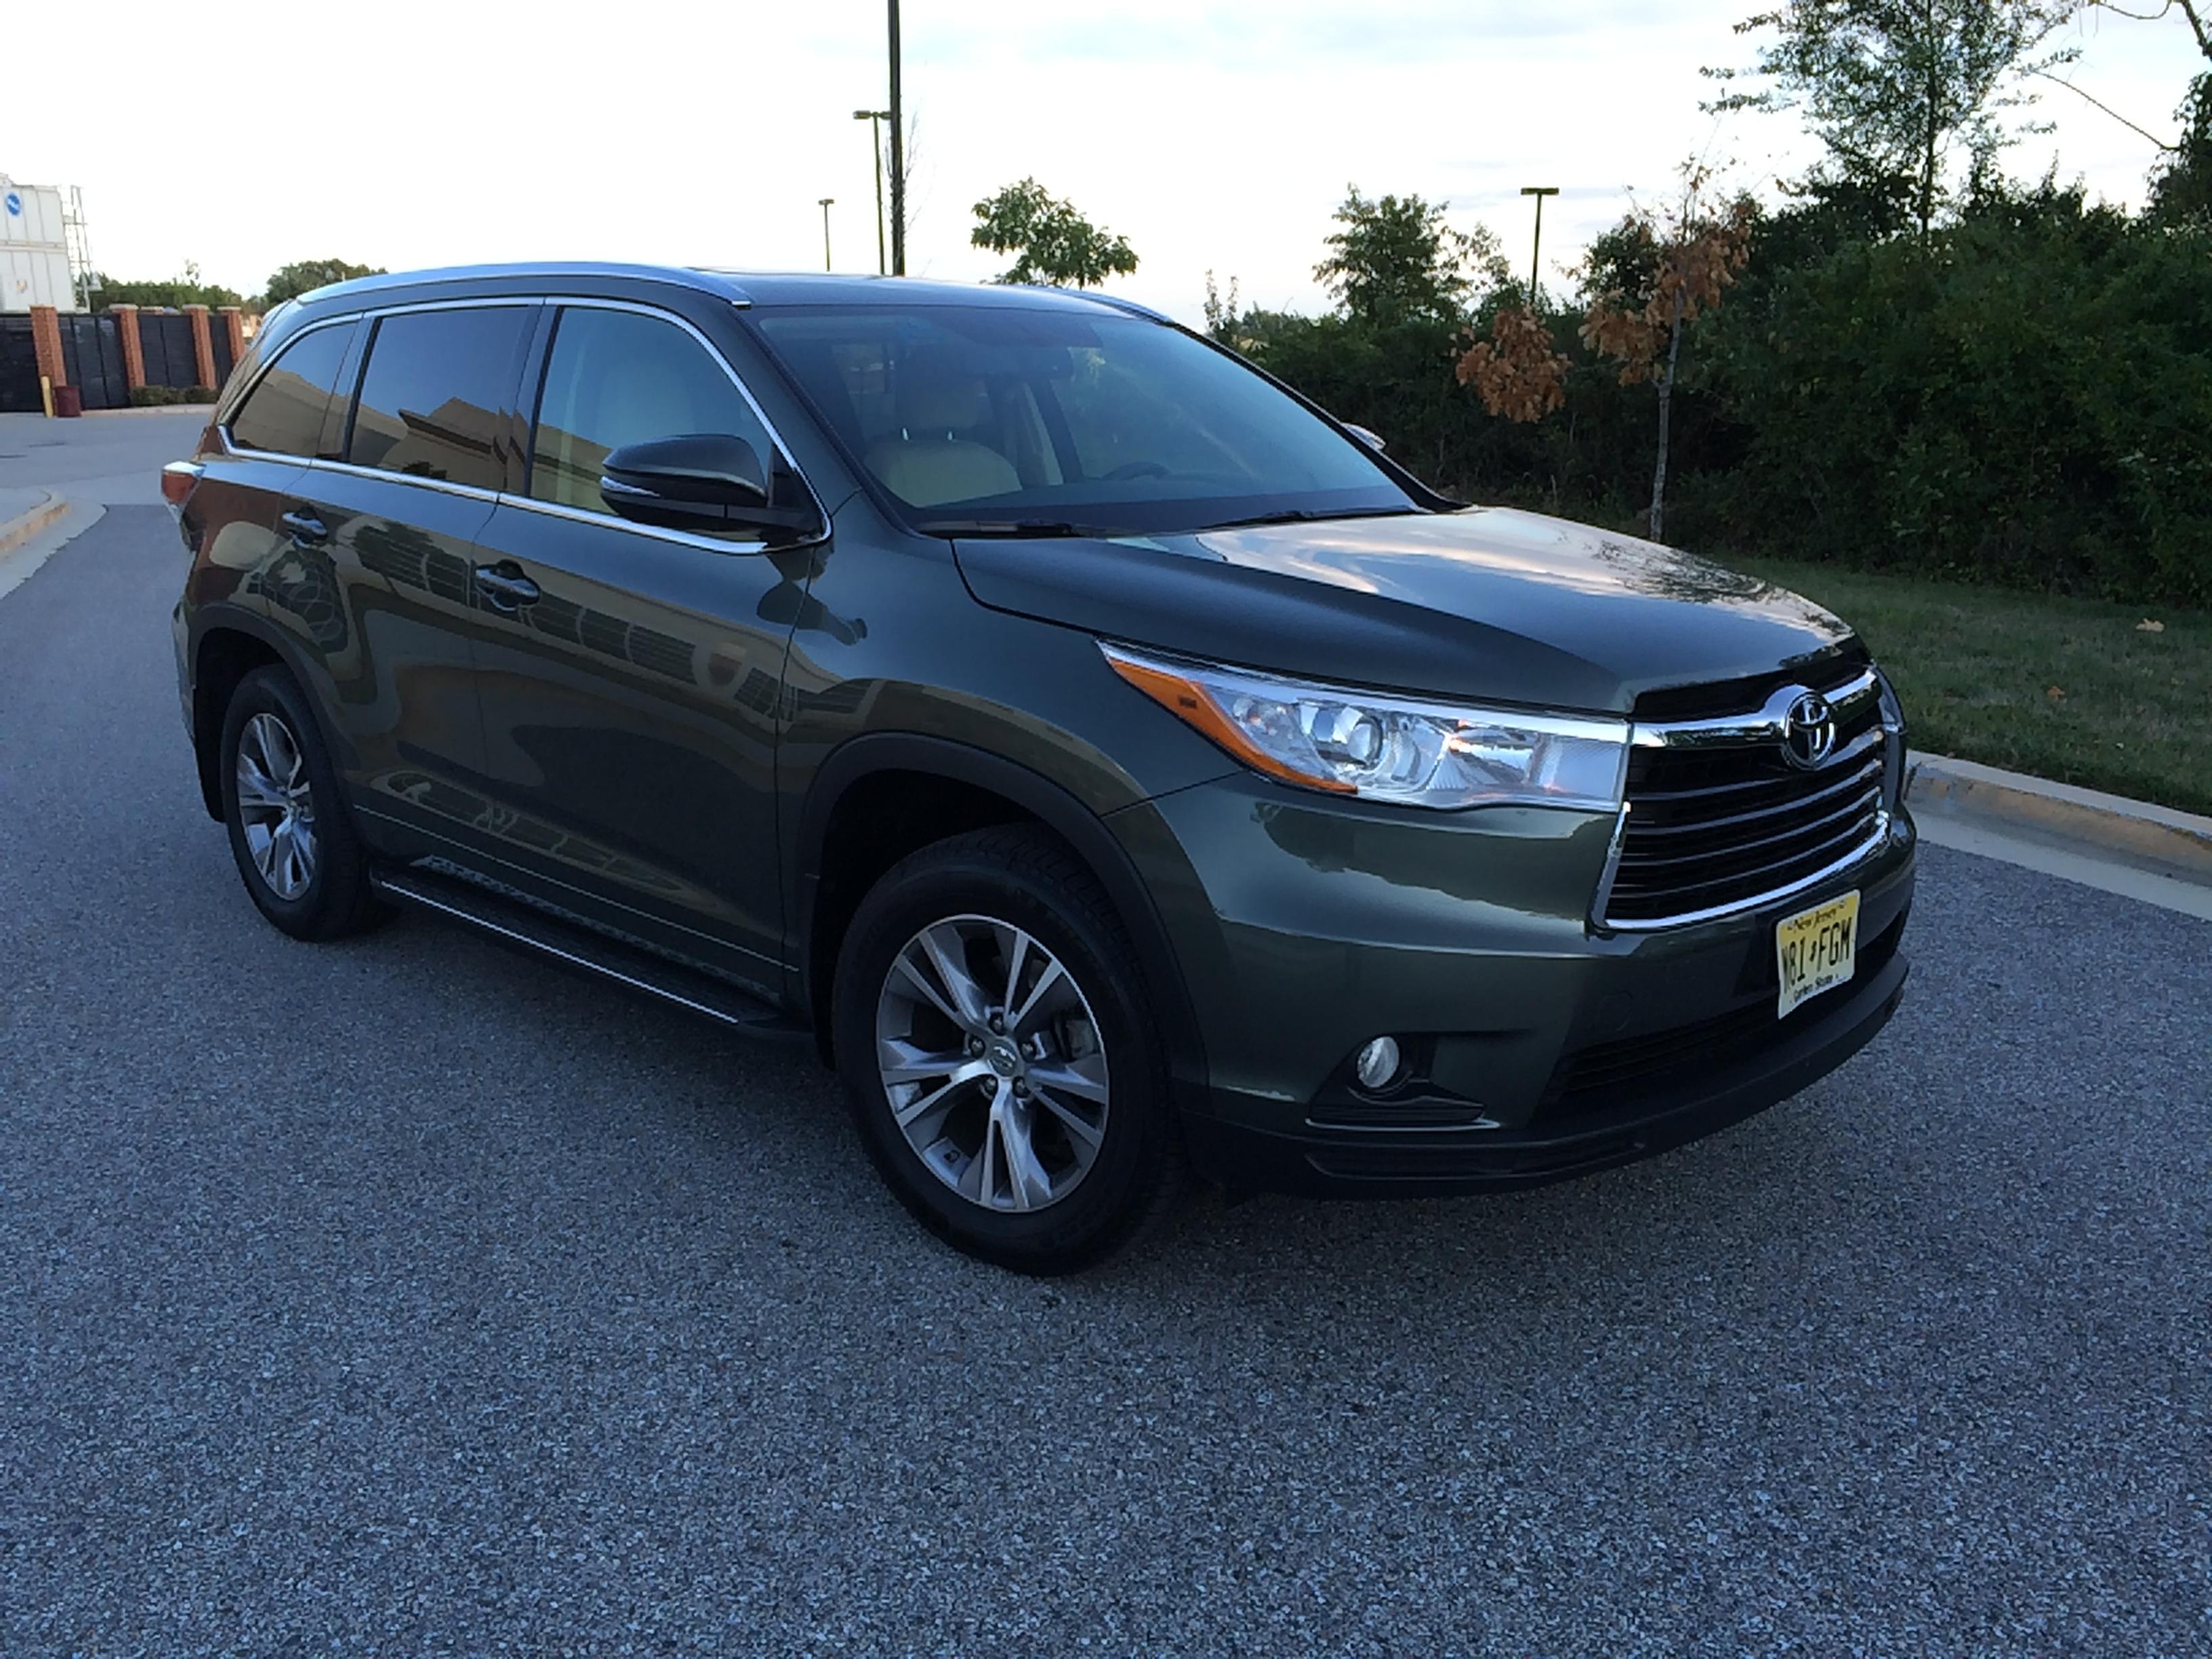 Car Report: Toyota Highlander a family-friendly crossover